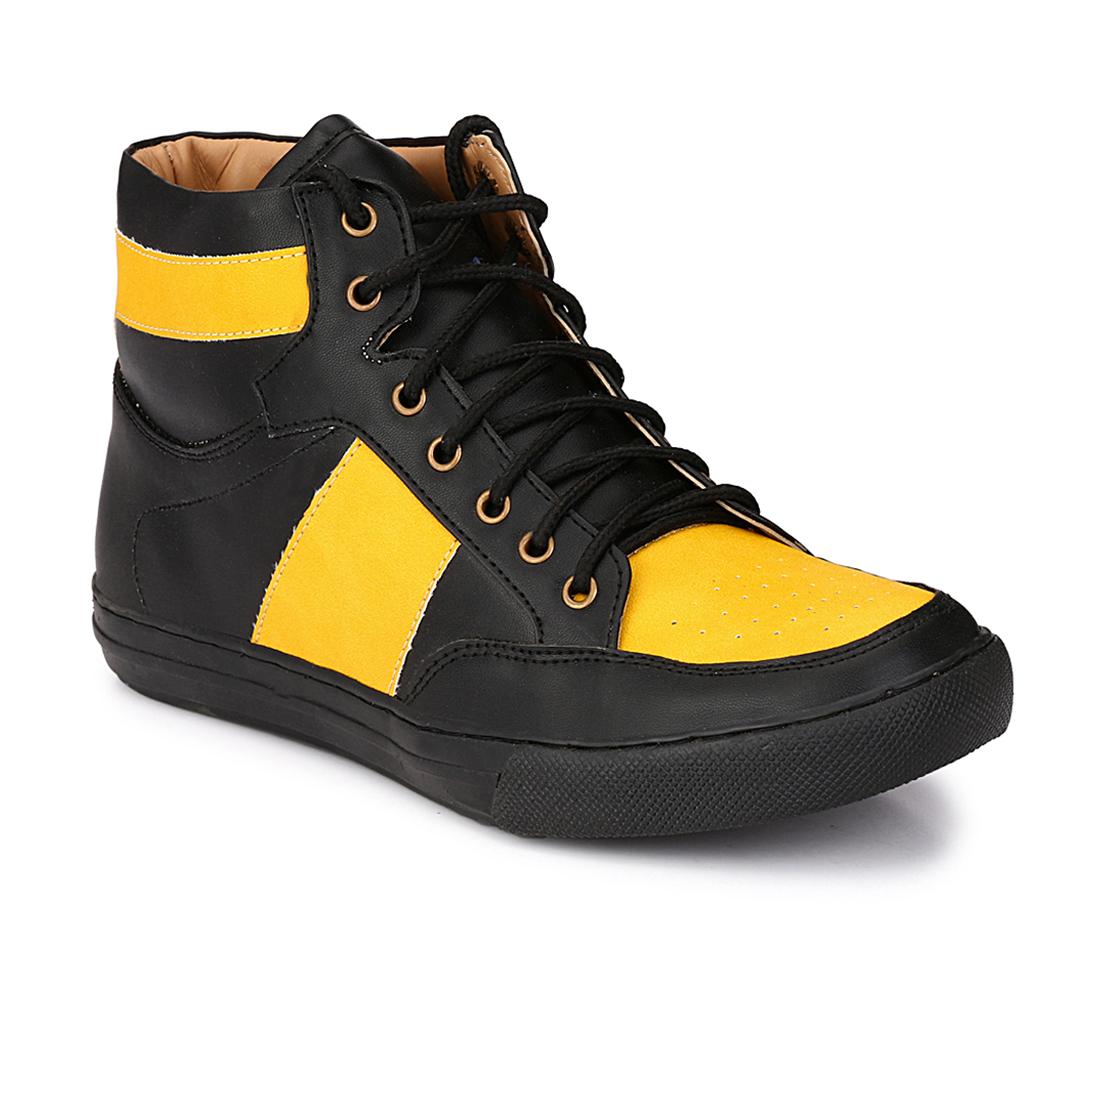 AADY AUSTIN   Aady Austin Luxe Boots - Black